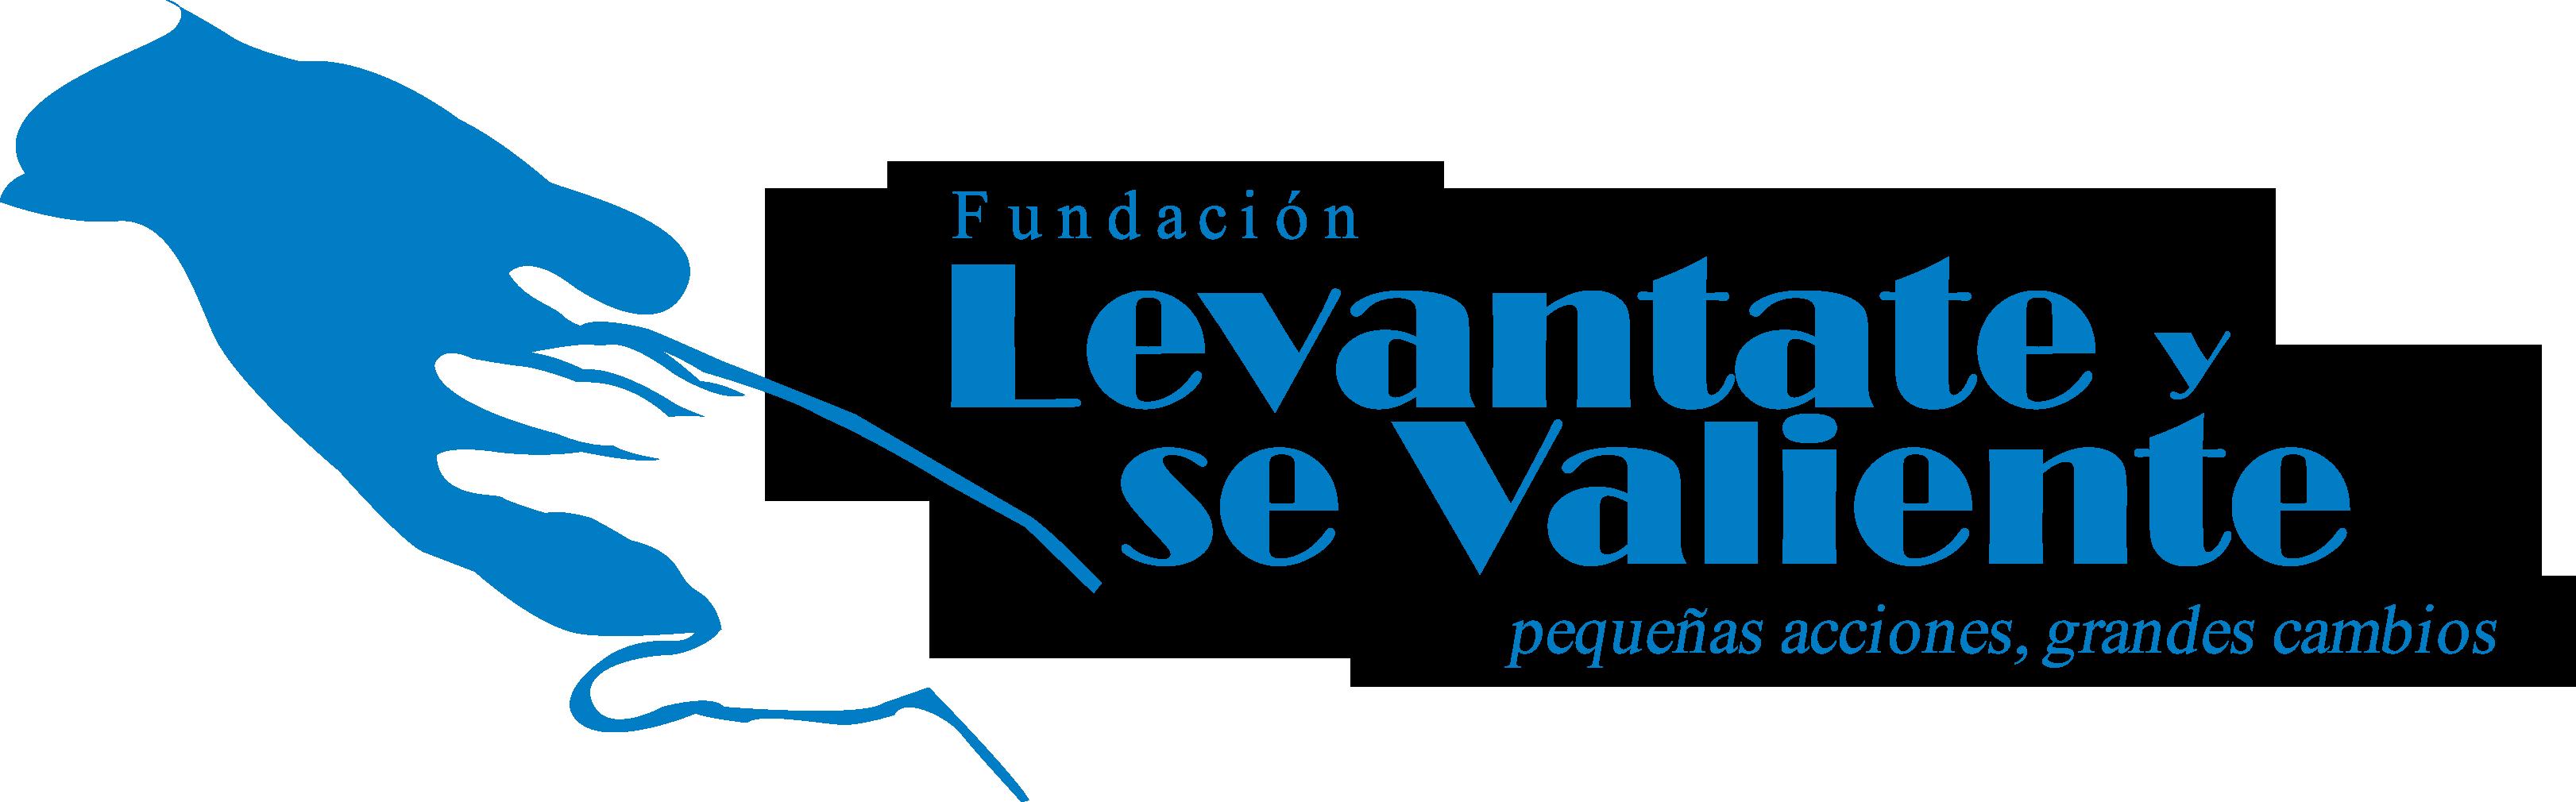 Logo completo